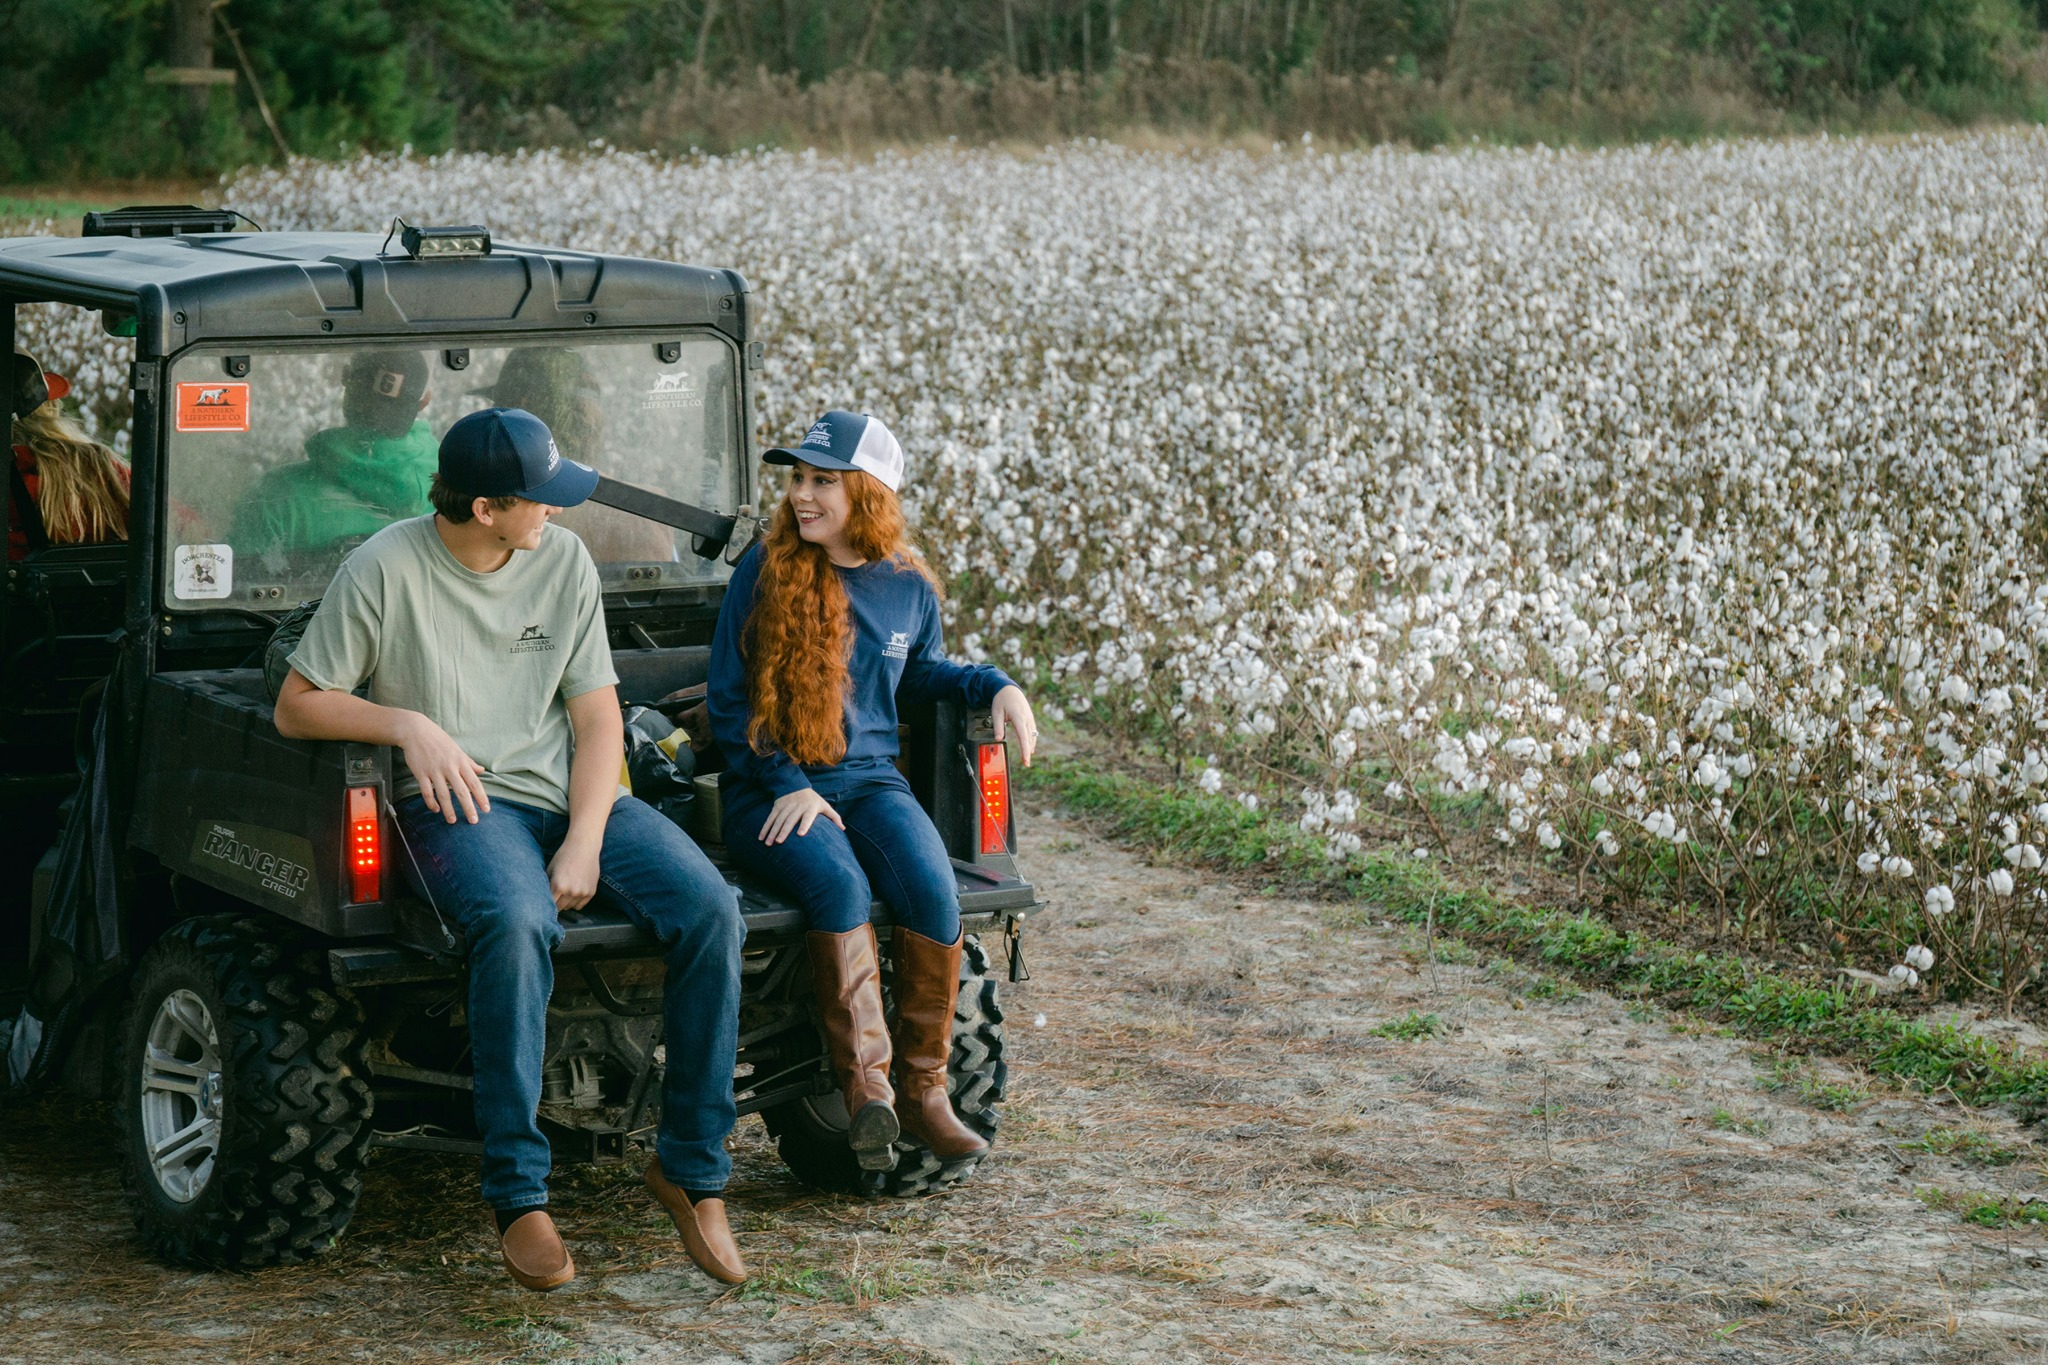 A Southern Lifestyle Company